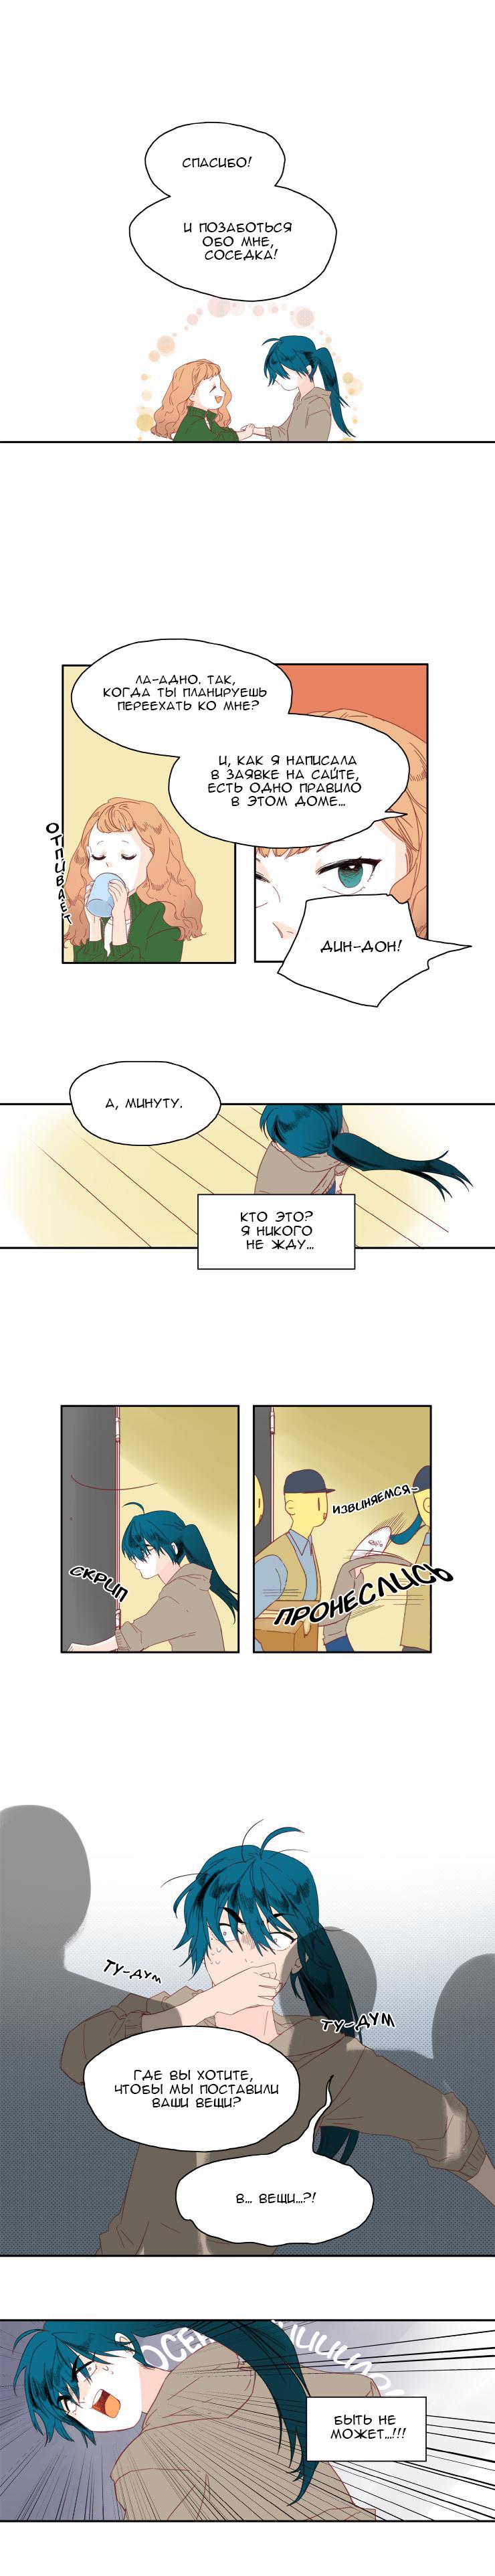 https://r1.ninemanga.com/comics/pic2/30/31902/344587/1512251402570.jpg Page 8